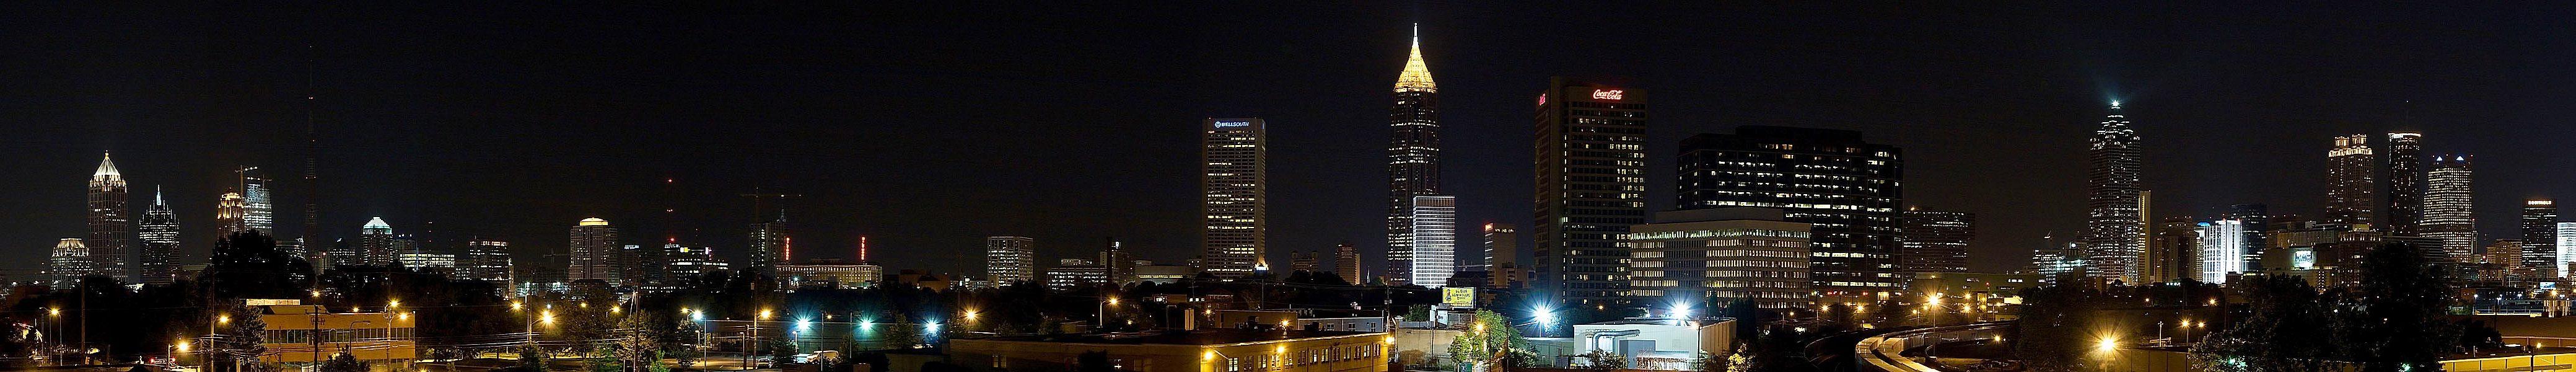 Atlanta speed dating companies act 1956 wikipedia